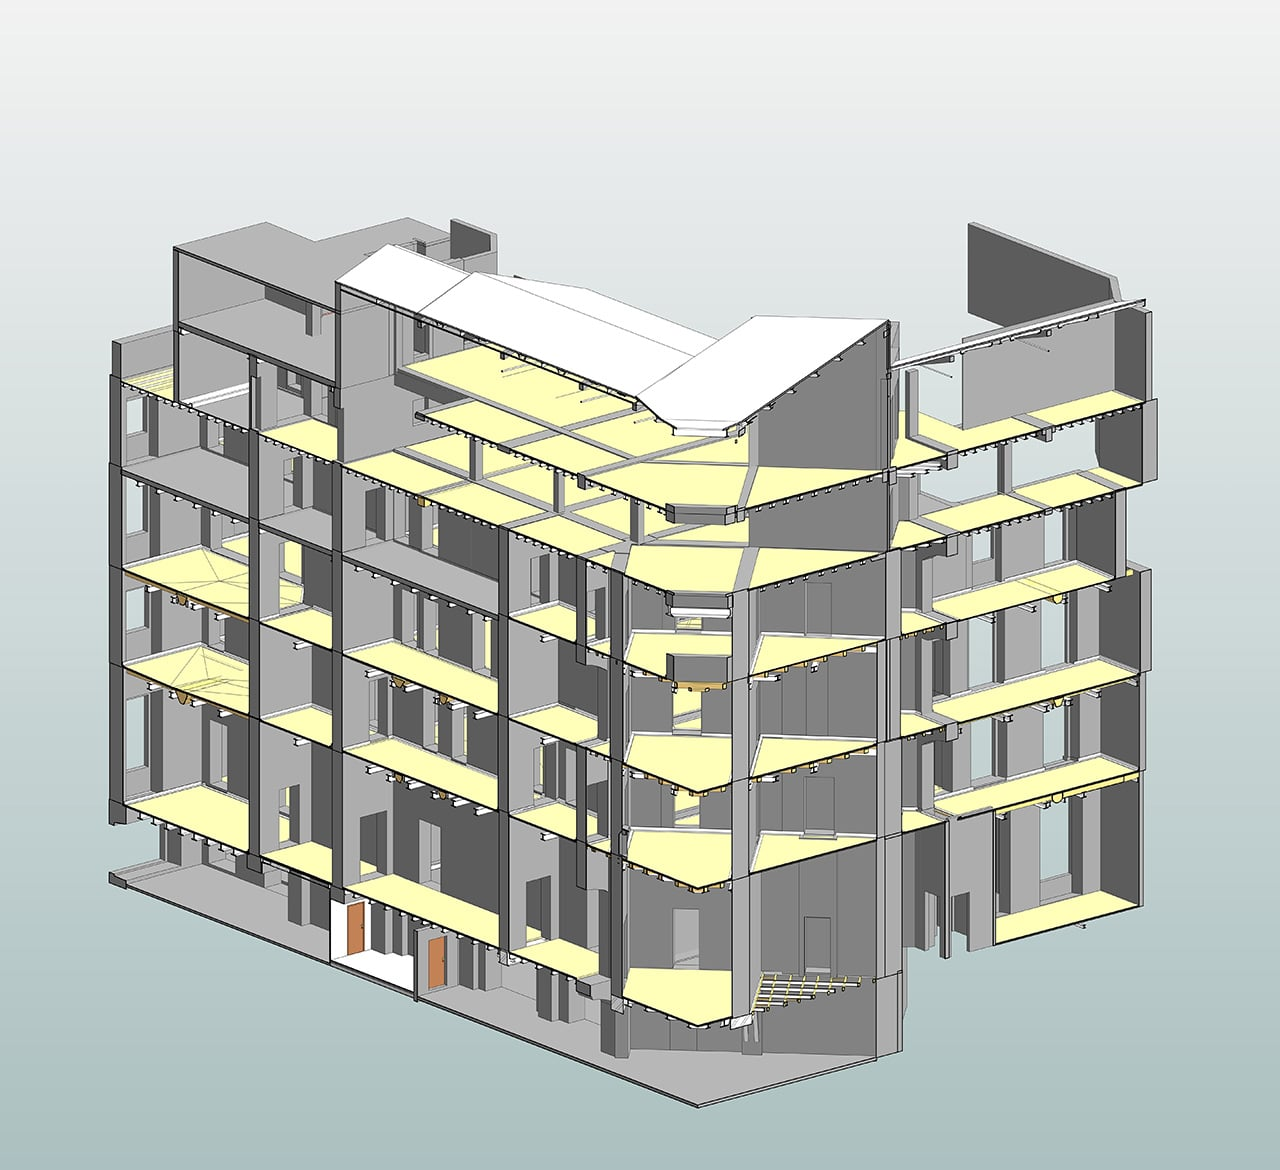 Bim Building Information Modeling Gaiagroup